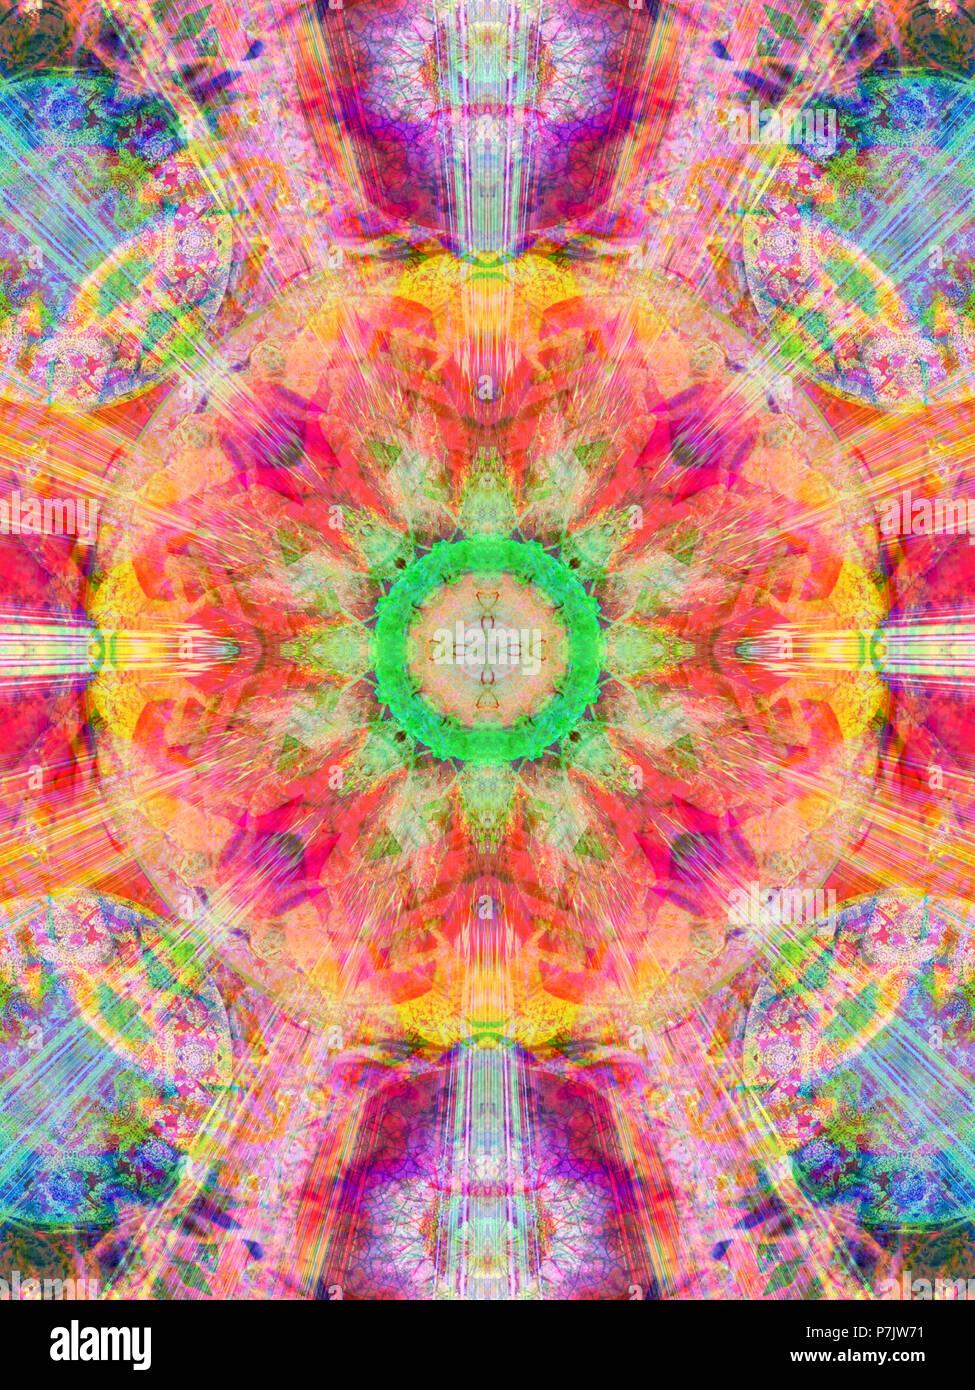 Fotografische Blume Mandala Bunt Farbenfroh Stockfoto Bild